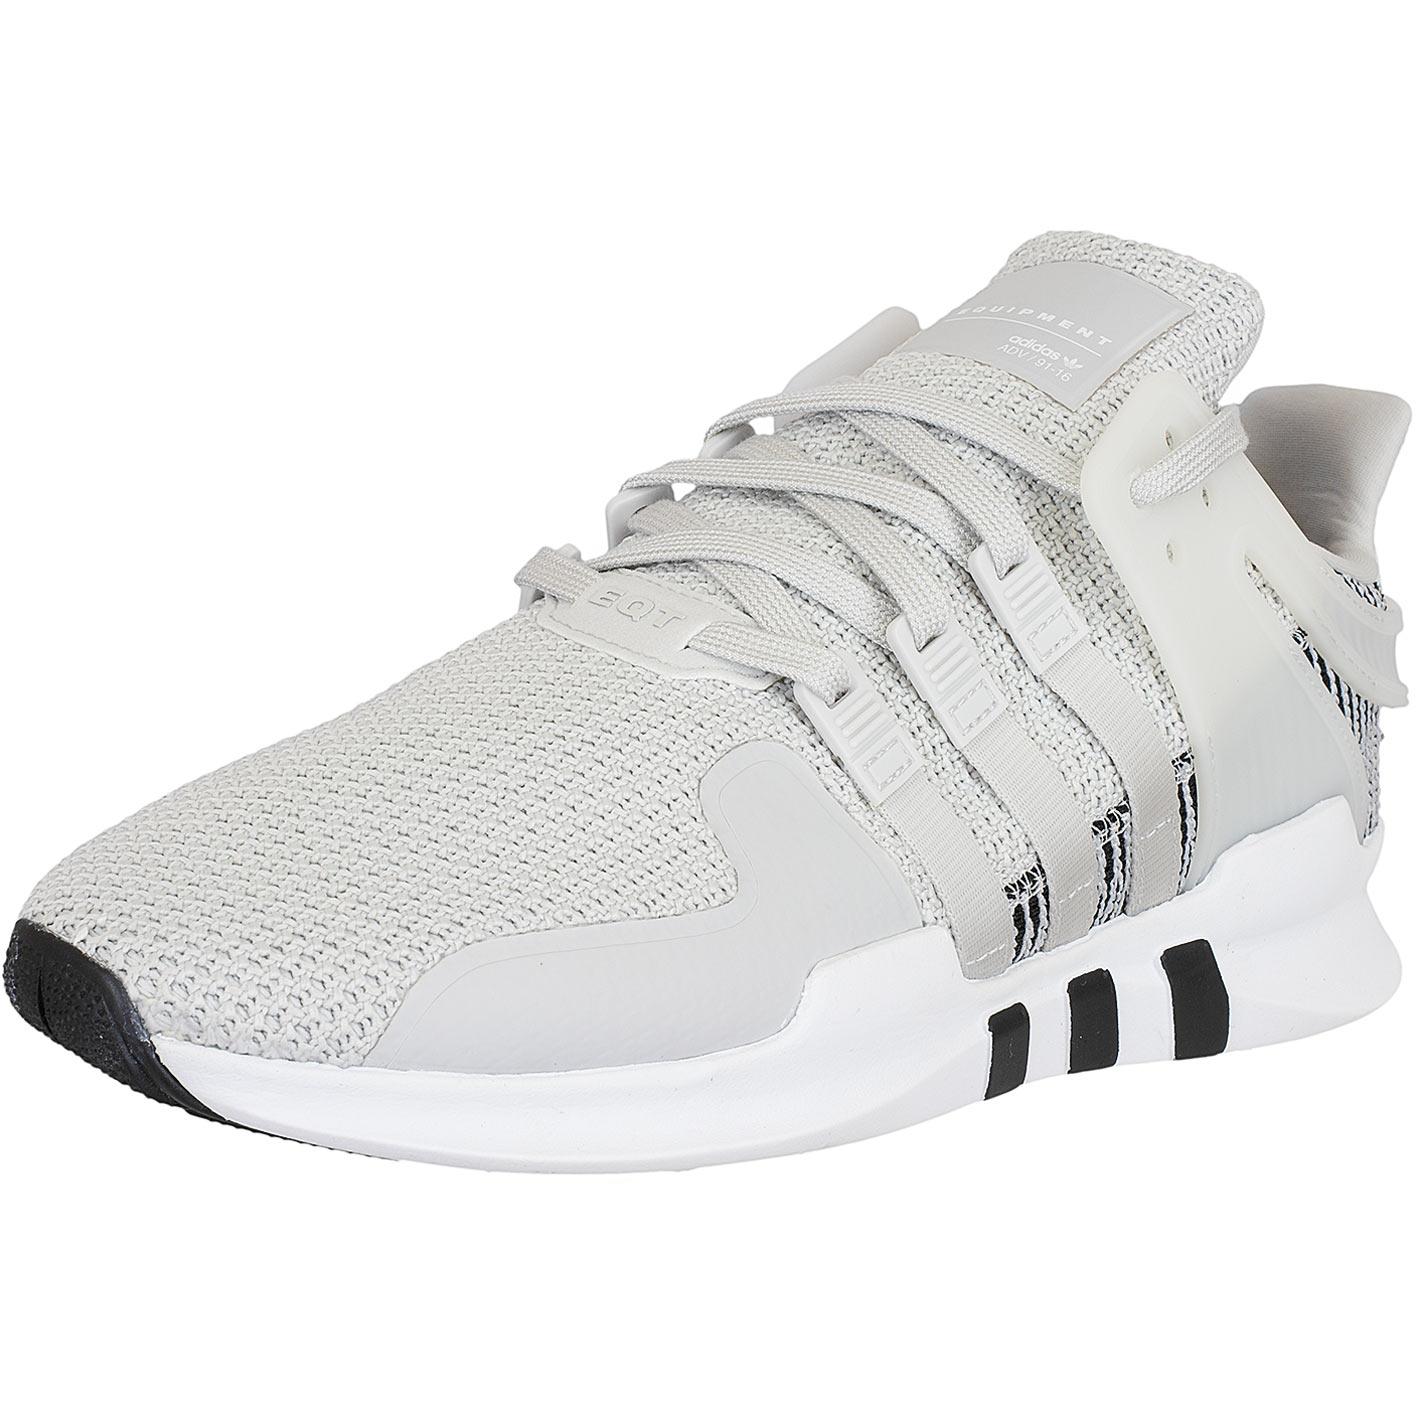 adidas Originals Herren EQT Support ADV Sneakers Steingrau